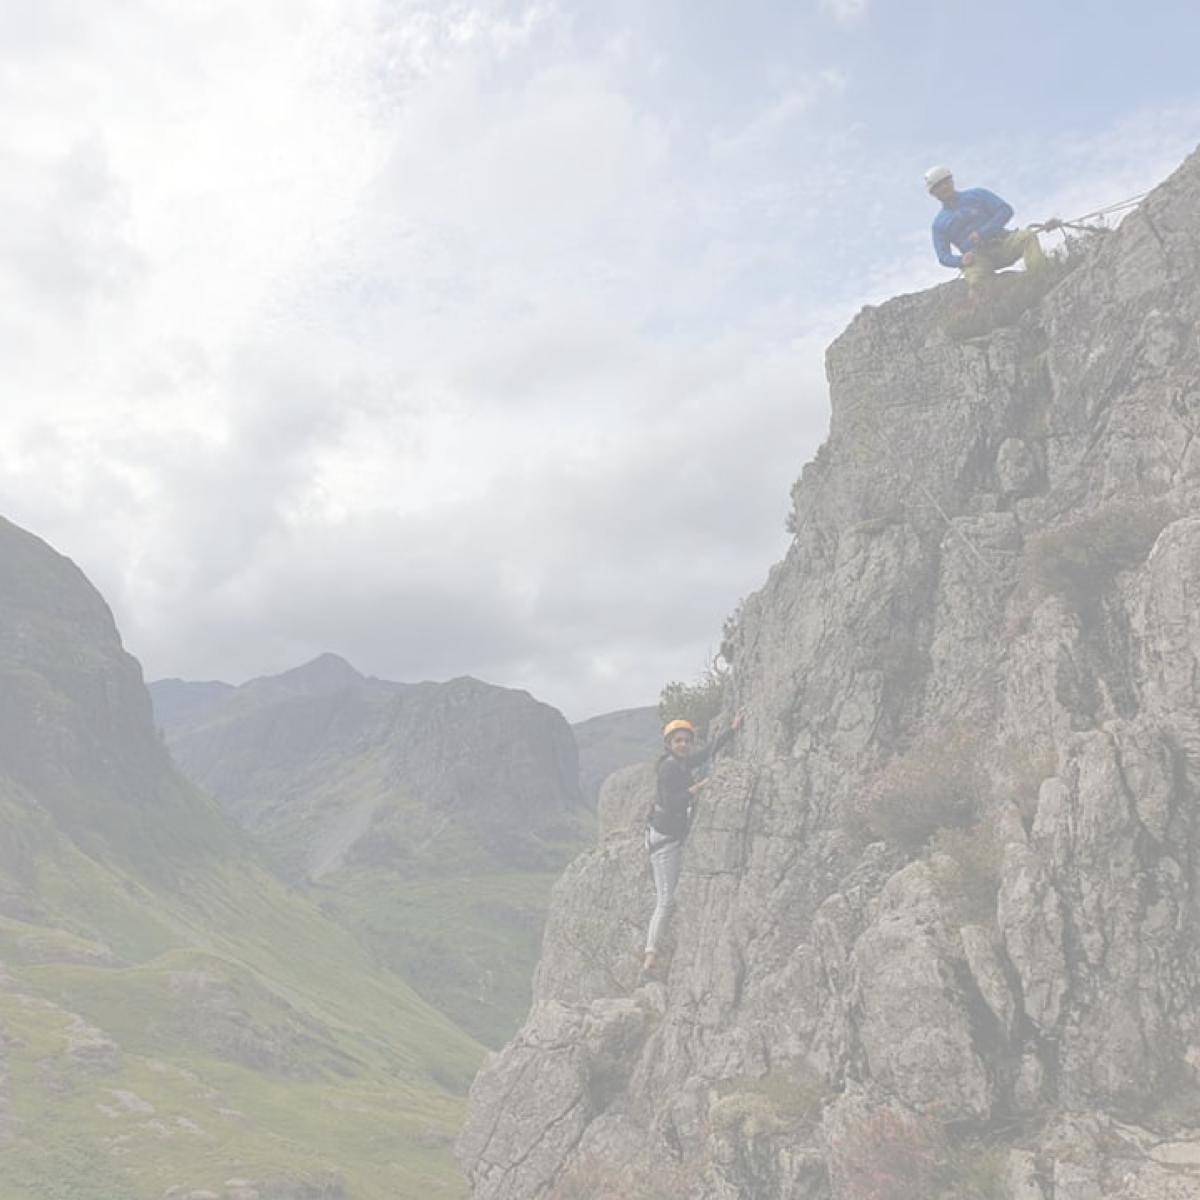 Rock Climbing / Abseiling